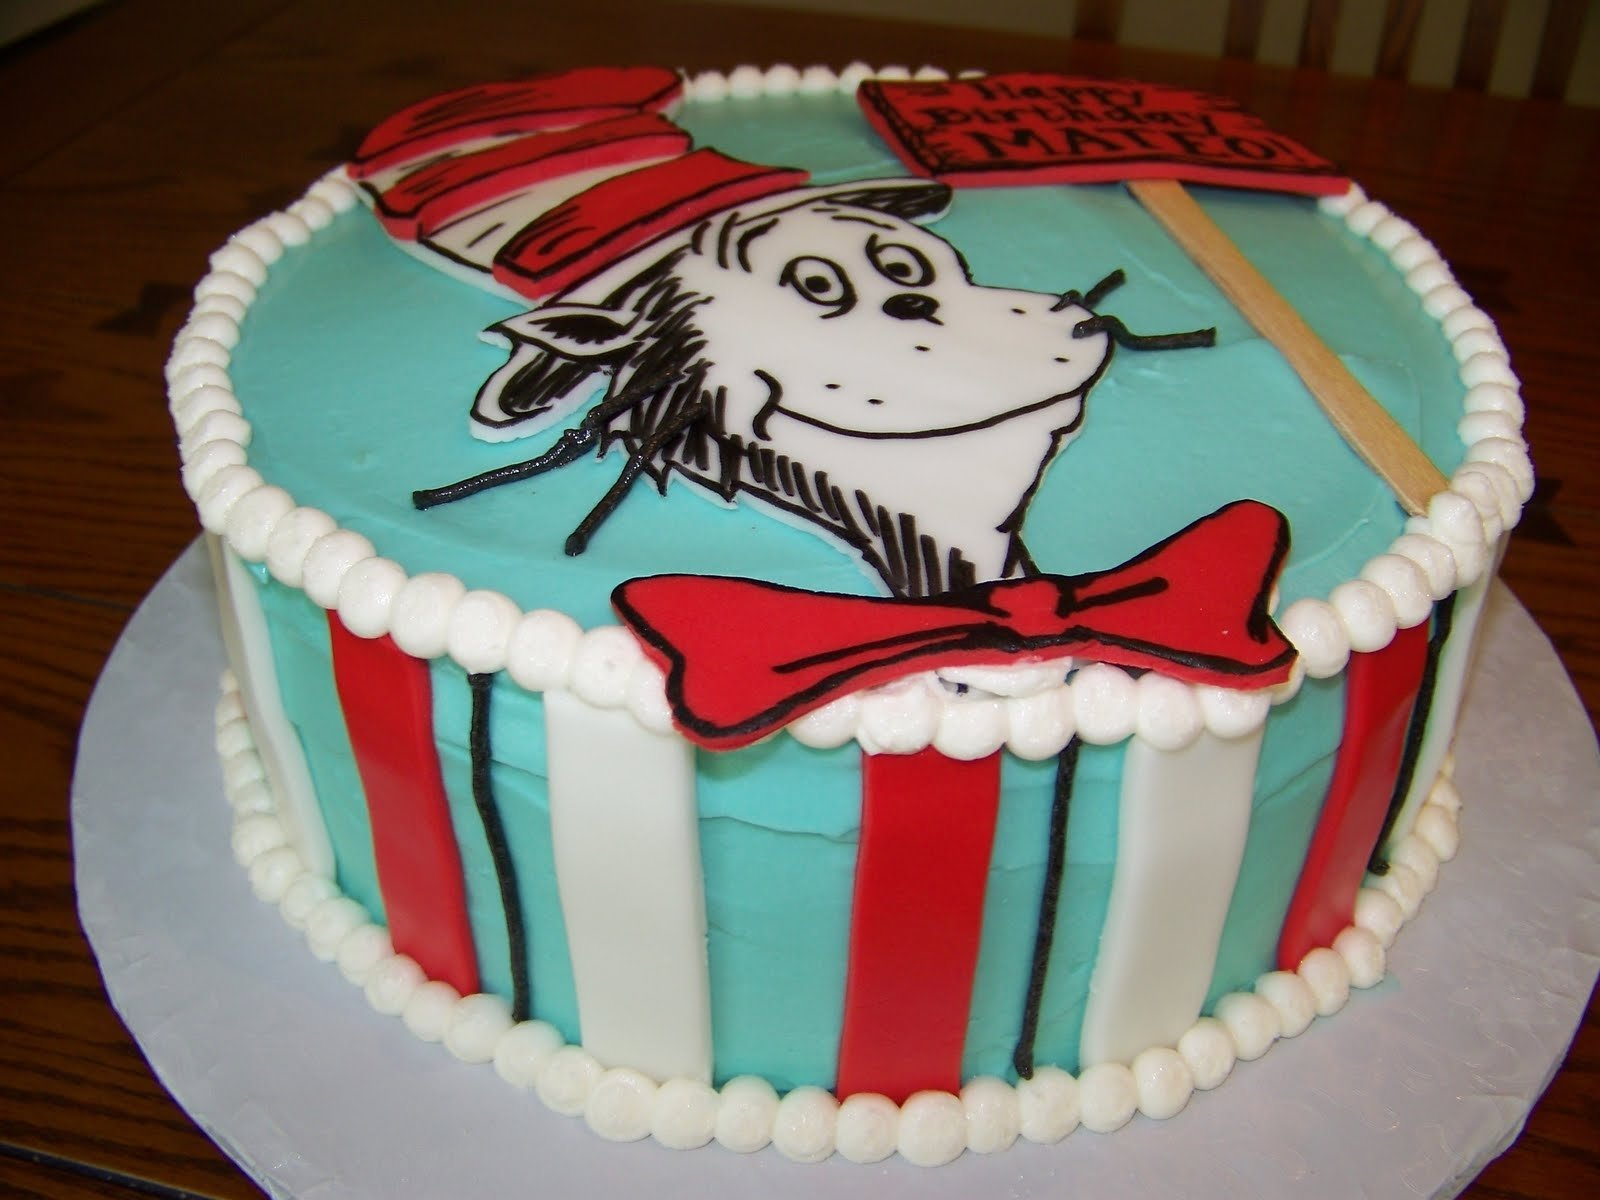 10 Attractive Cat In The Hat Cake Ideas cat in the hat birthday cakes plumeria cake studio dr seuss cat